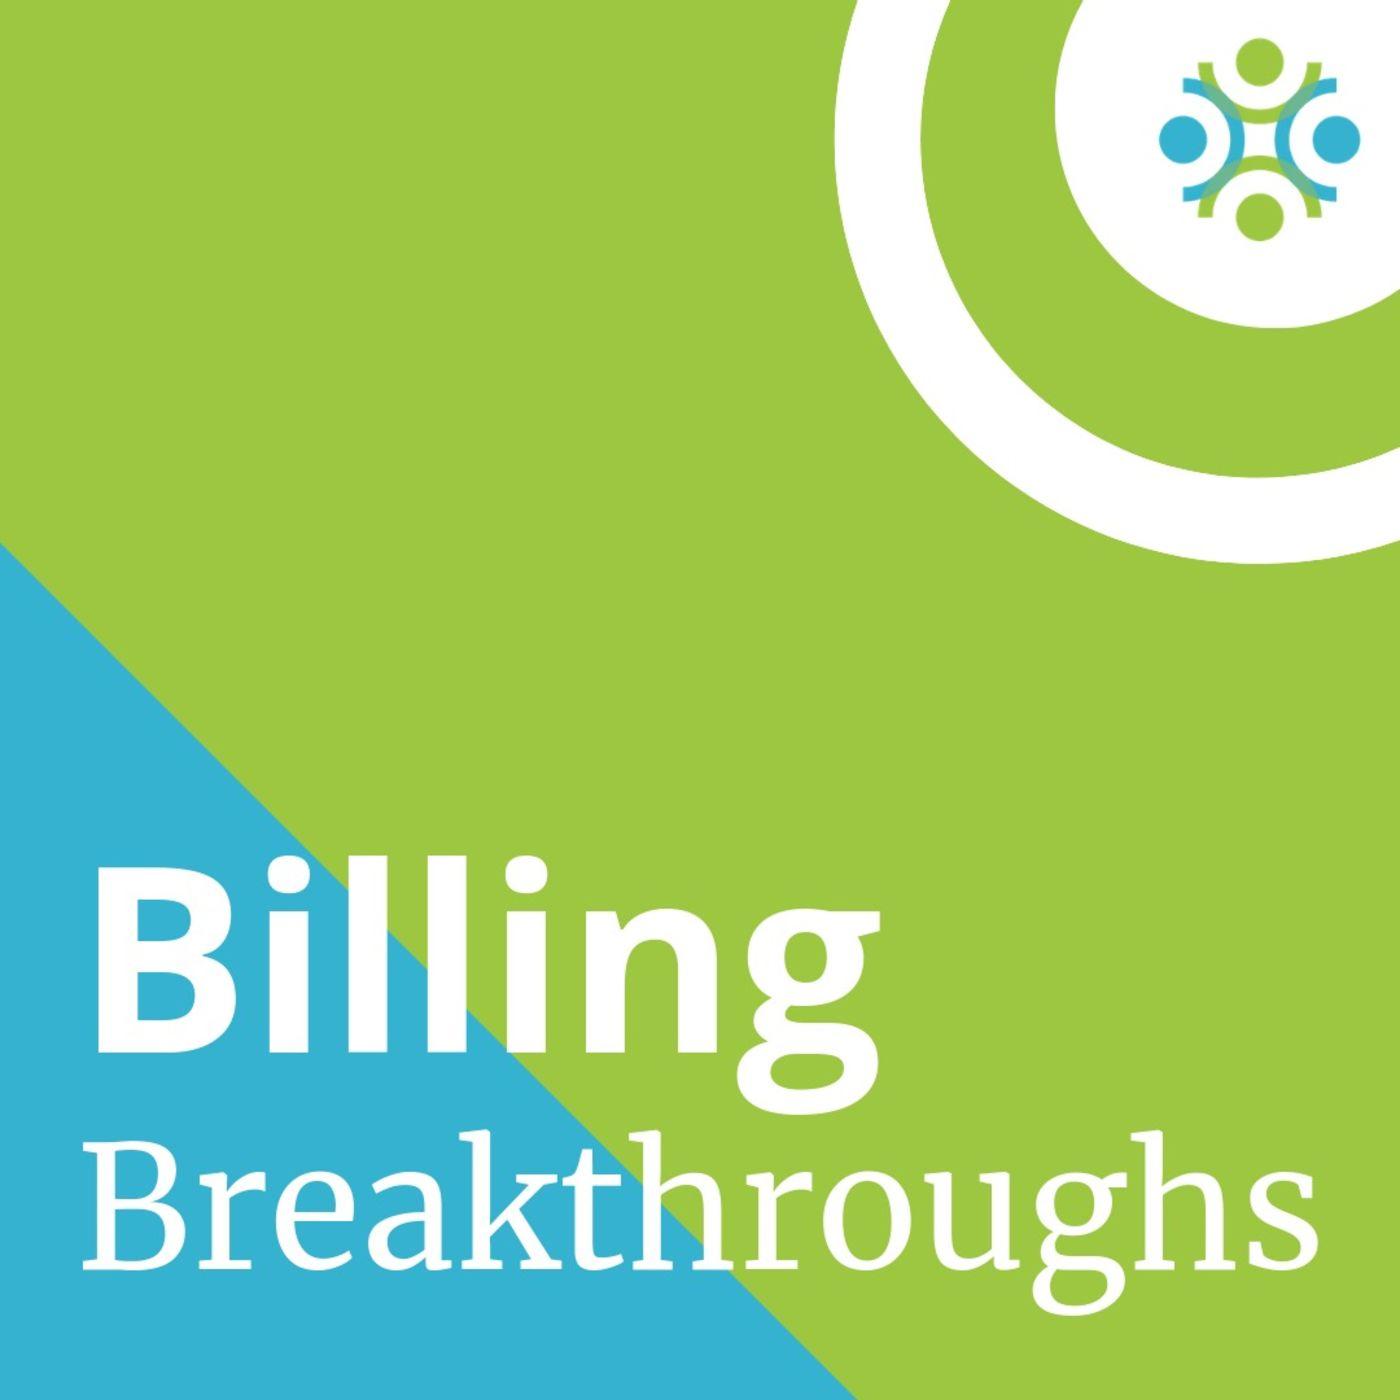 Billing Breakthroughs